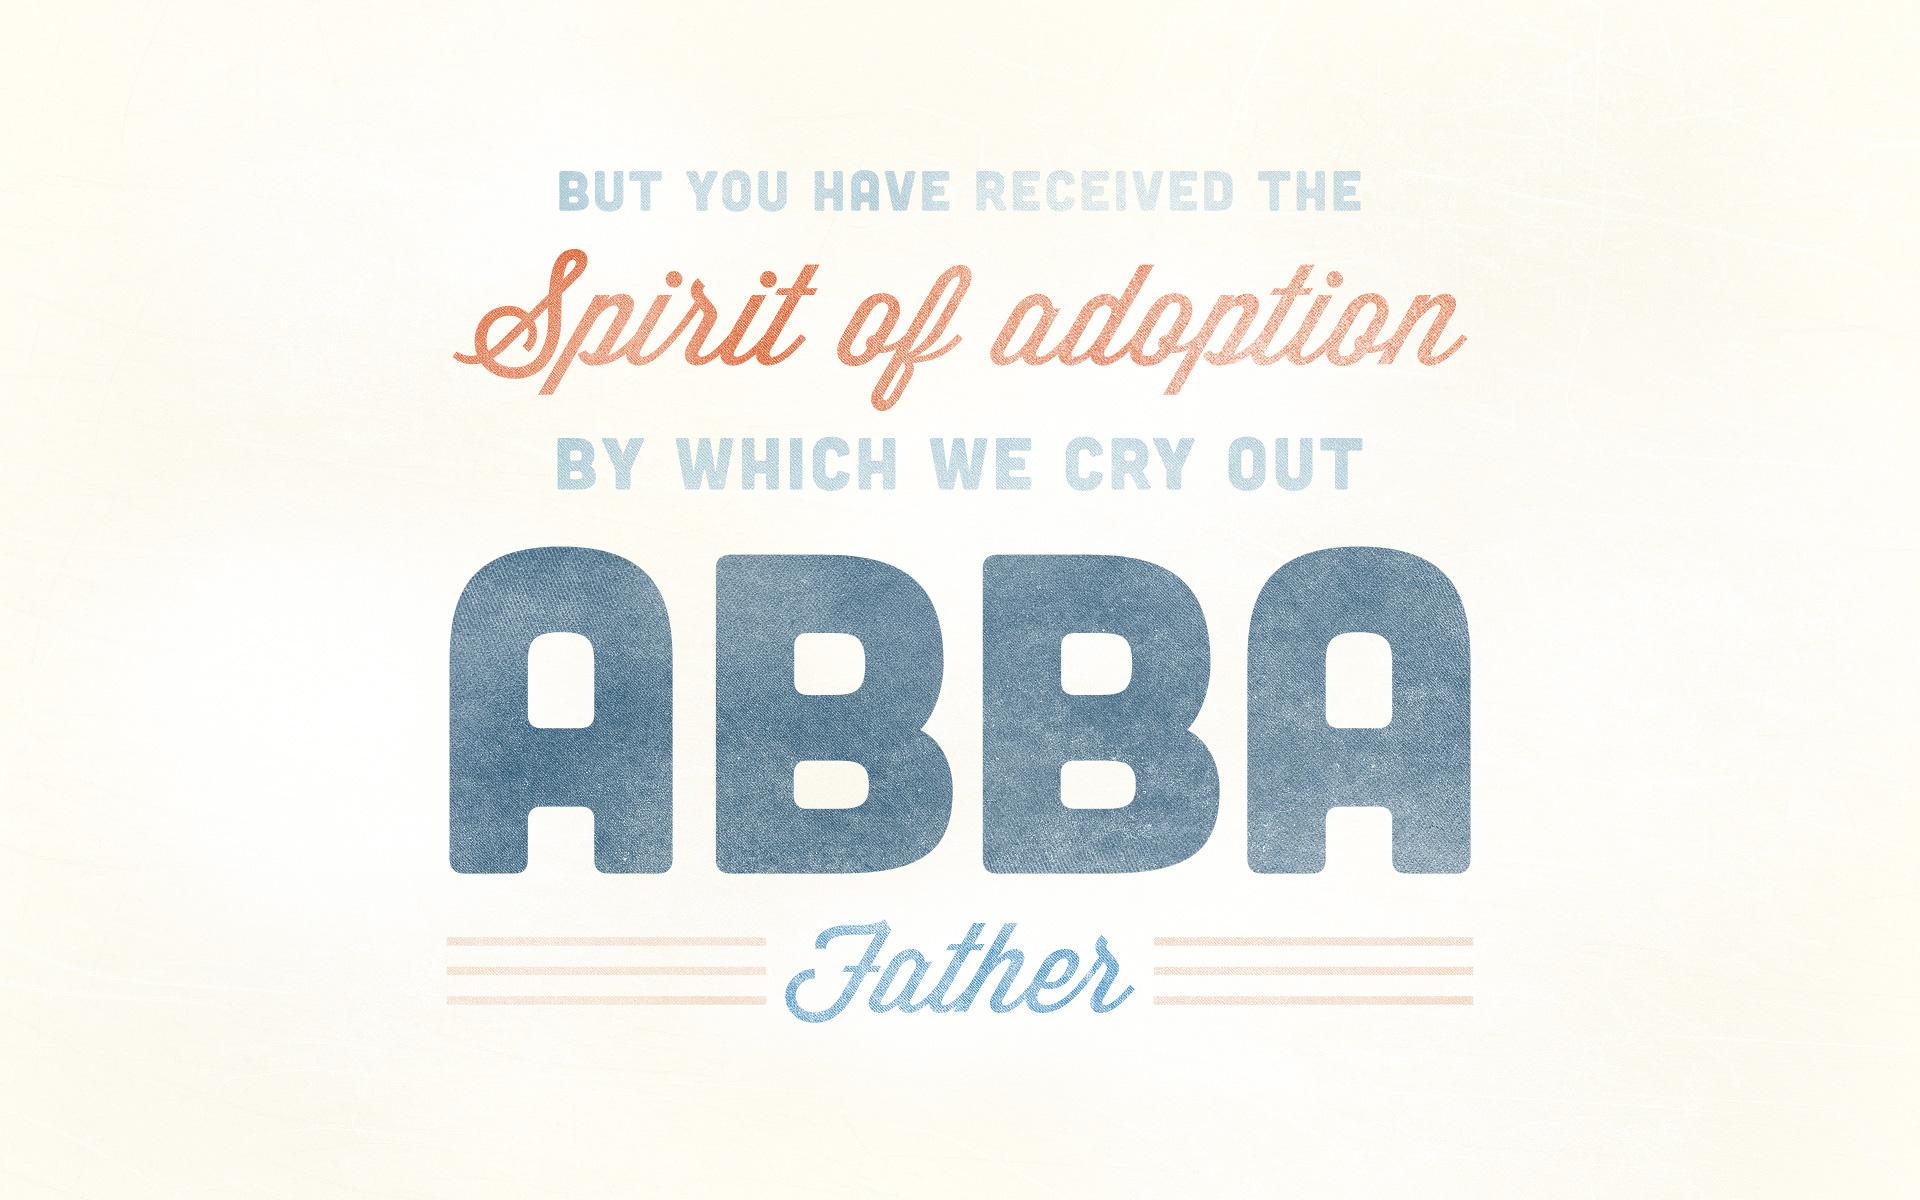 Galatians Abba Father